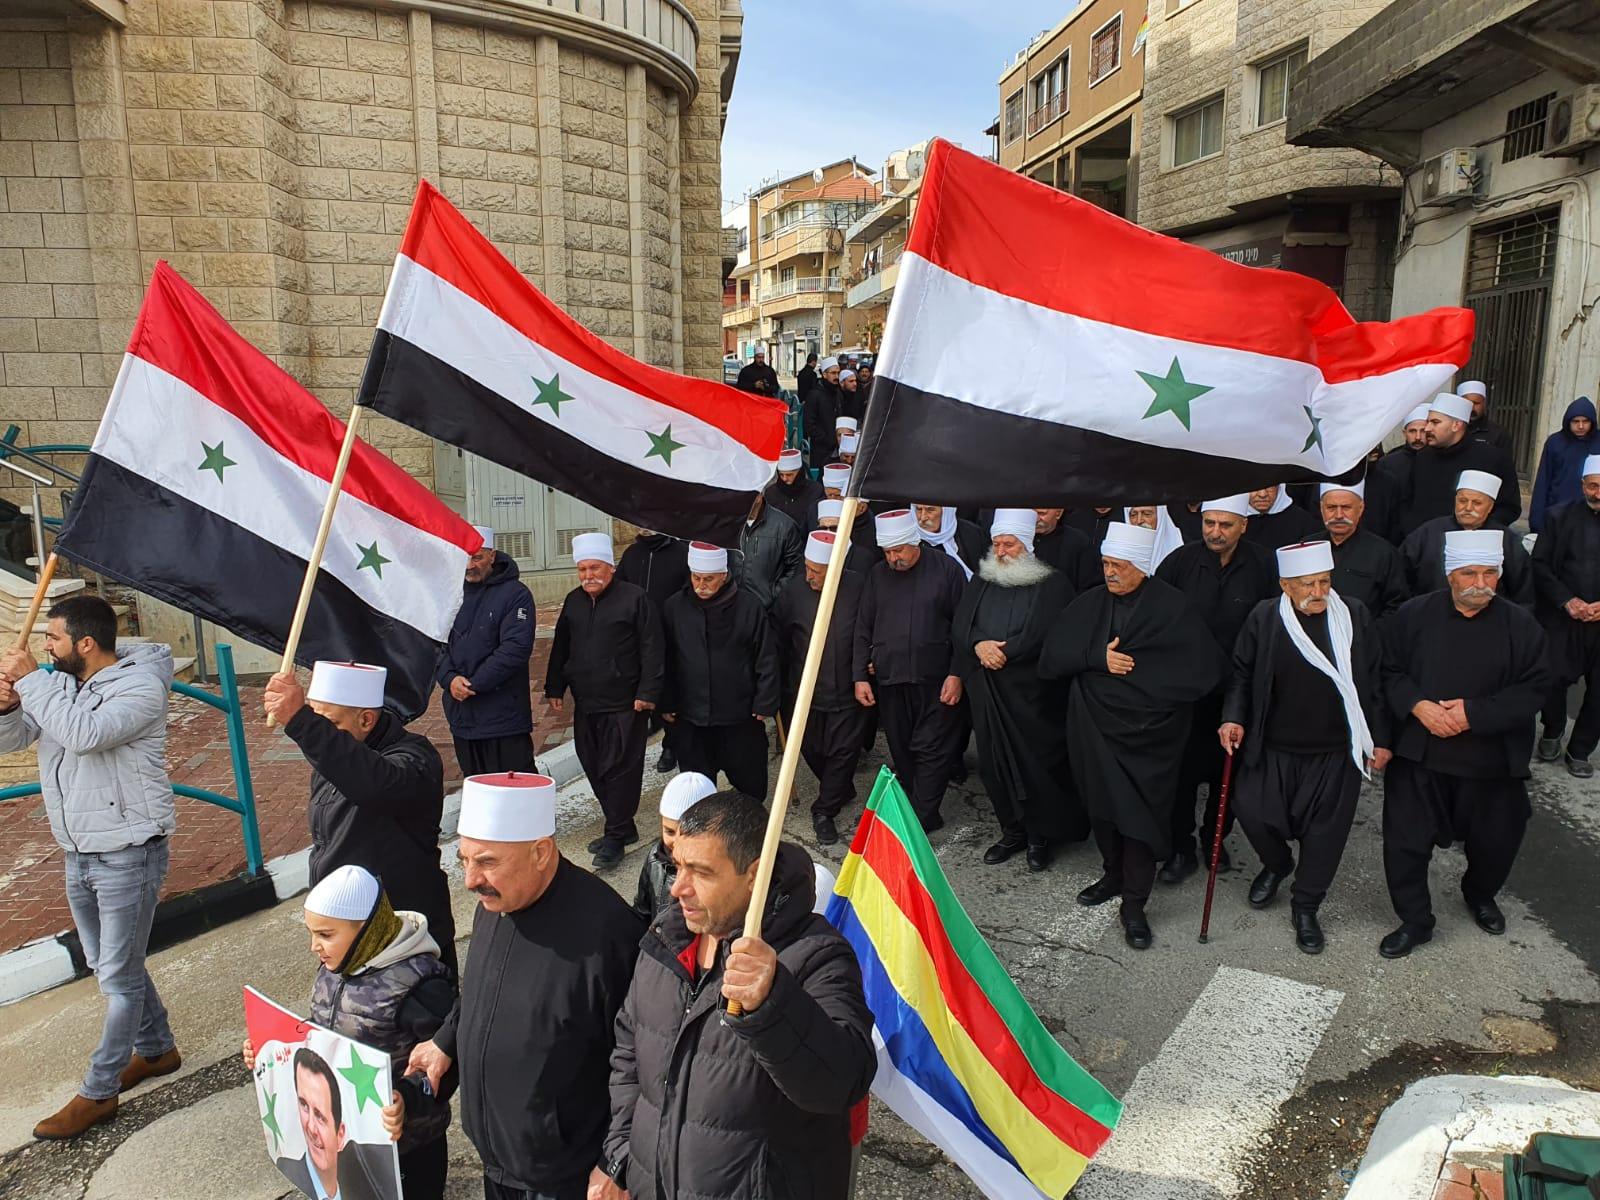 Photo of بيان صادر عن الهيئة الدّينيّة في الجولان السوري المحتل حول المدعو جواد ابراهيم.